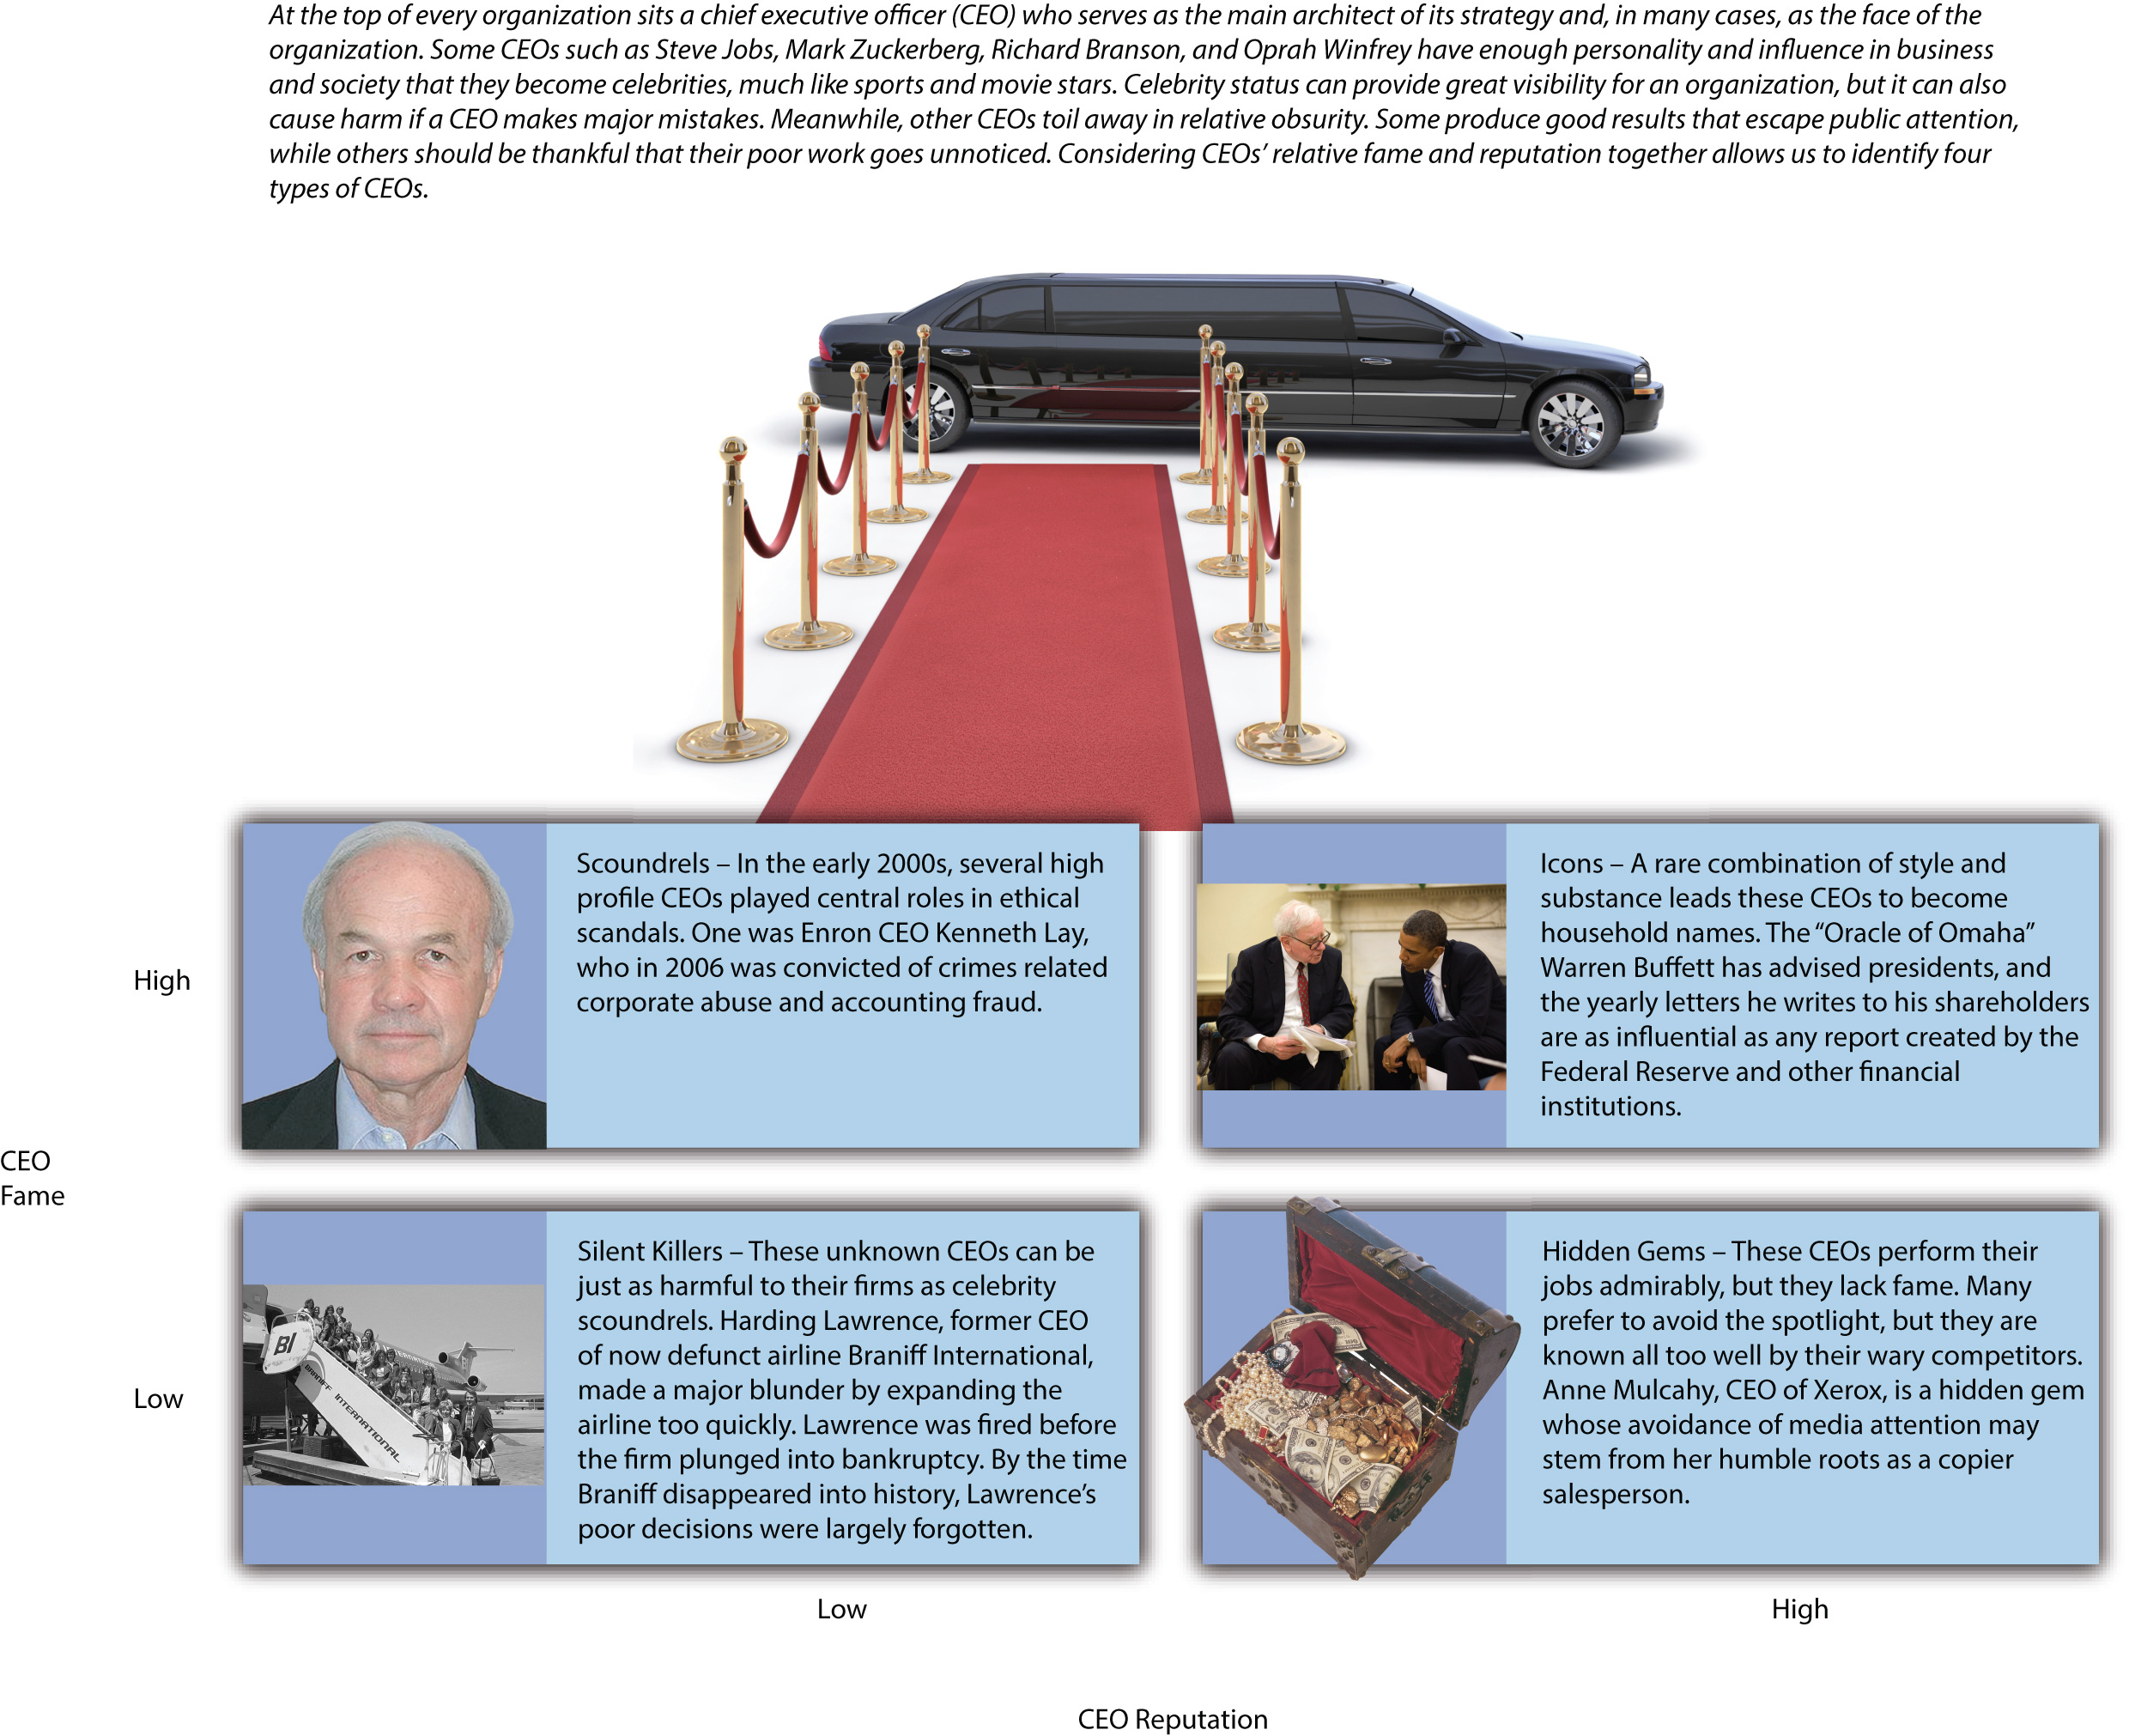 enron case study summary Enron case study powerpoint - authorstream presentation  enron corporation, based out of houston, texas was an american.